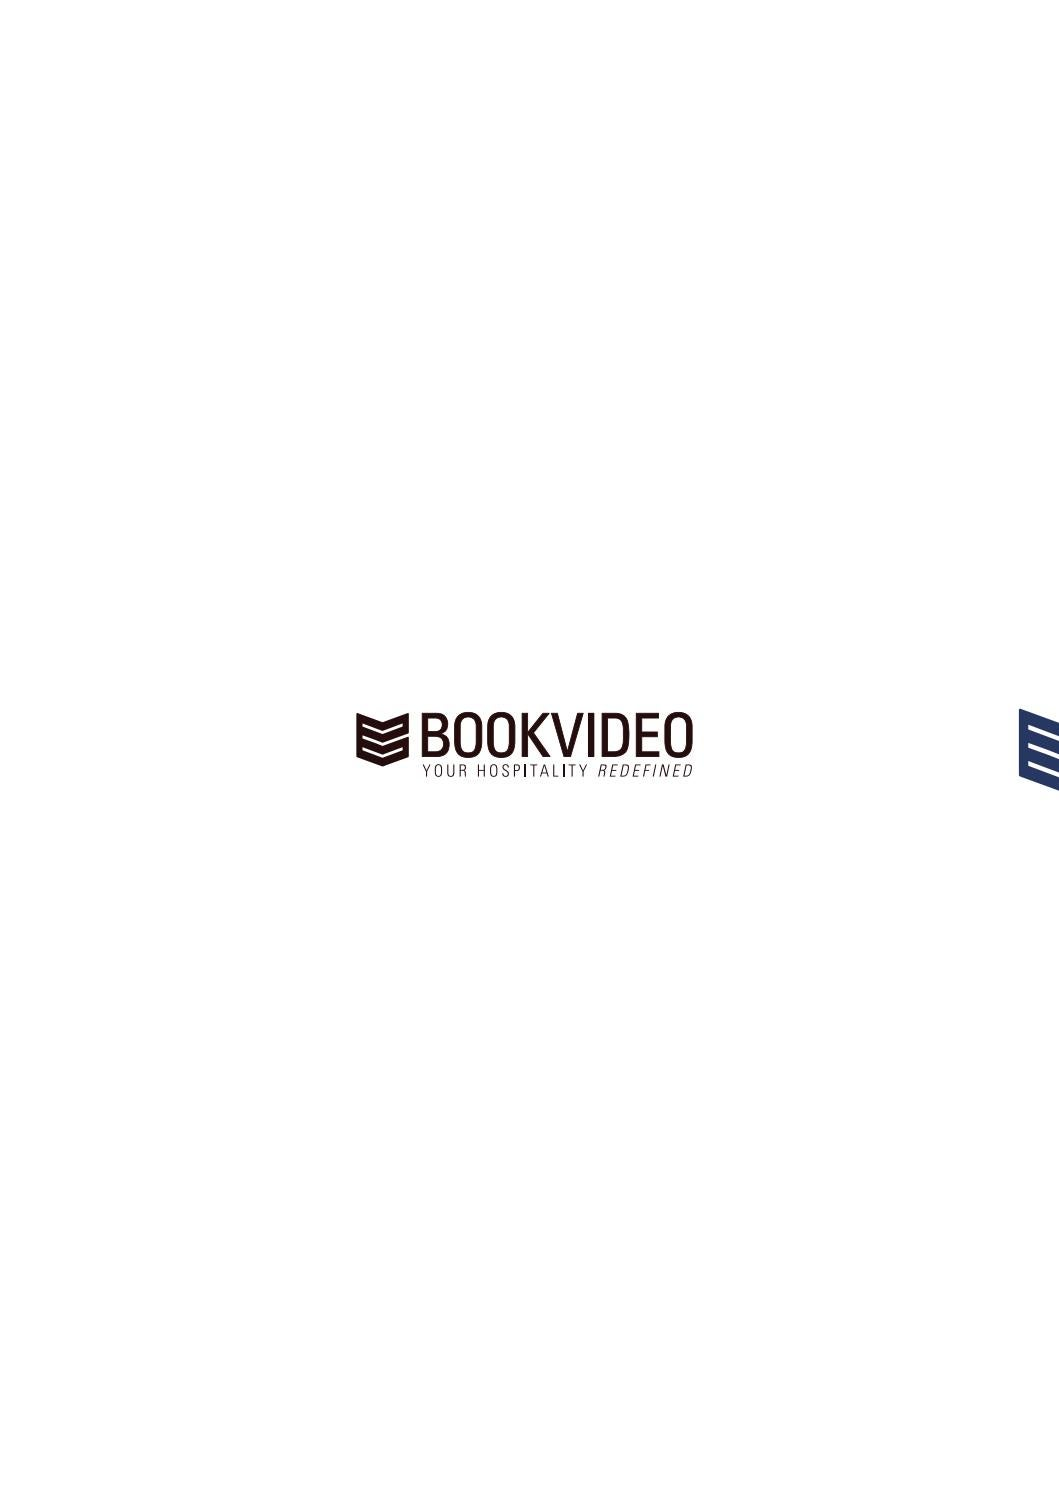 Presentation Globale Anglais By Bookvideo Issuu